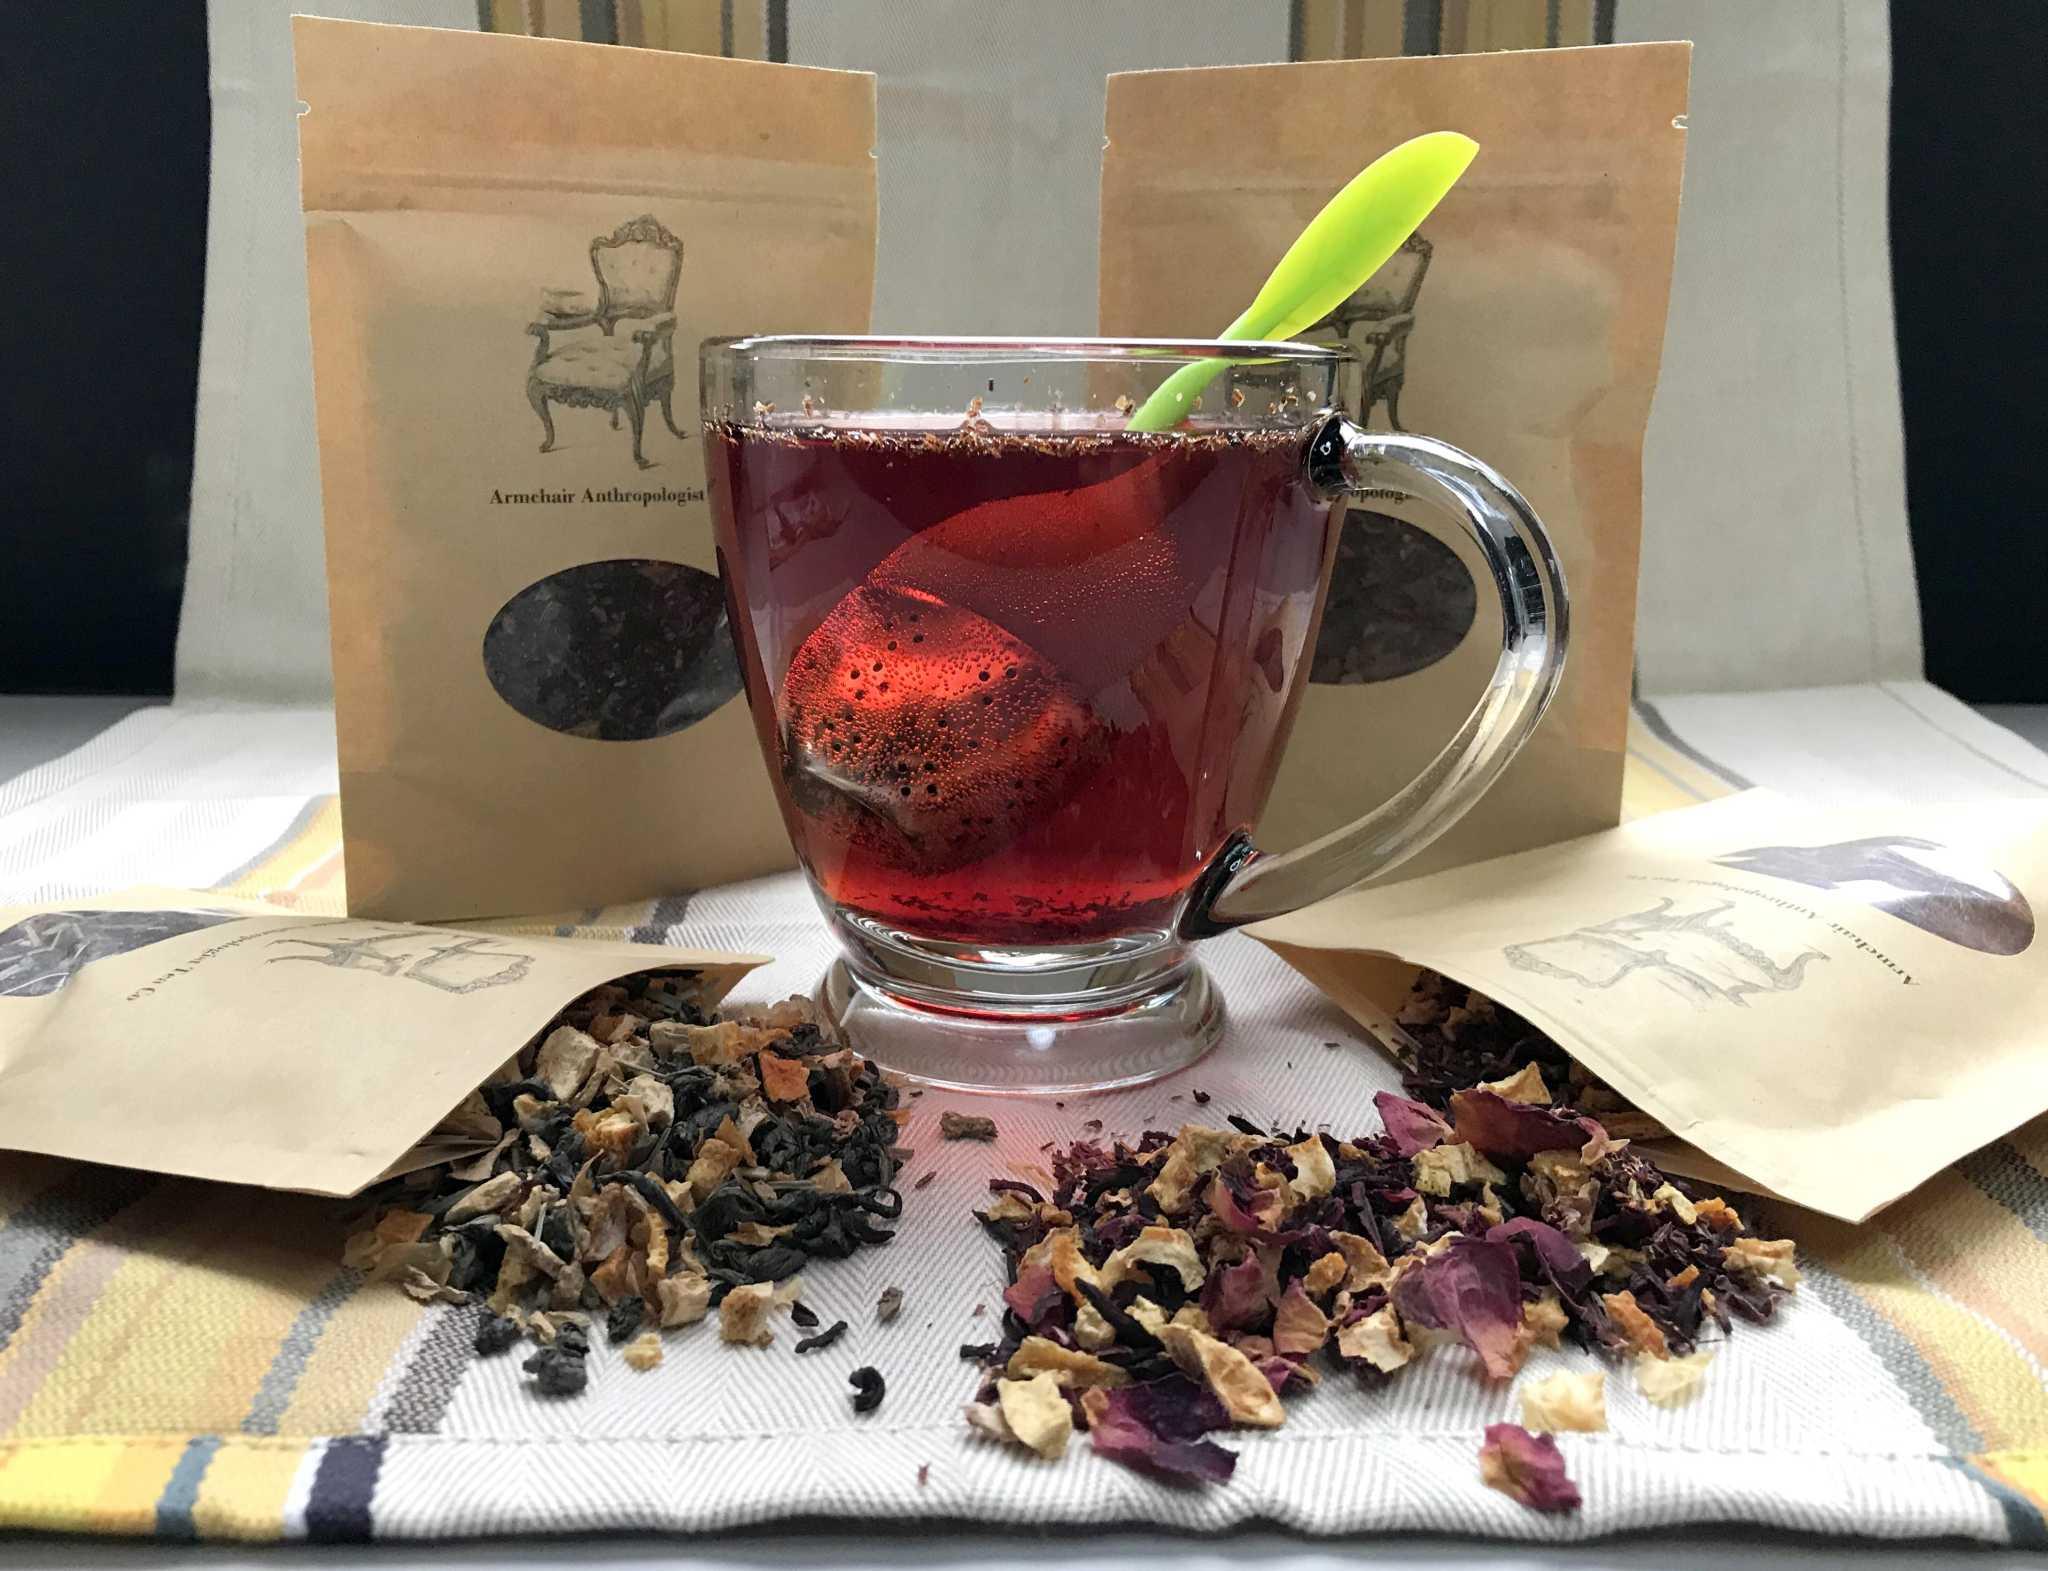 San Antonio tea company Armchair Anthropologist Tea Co. has the hot cup of tea you need this winter